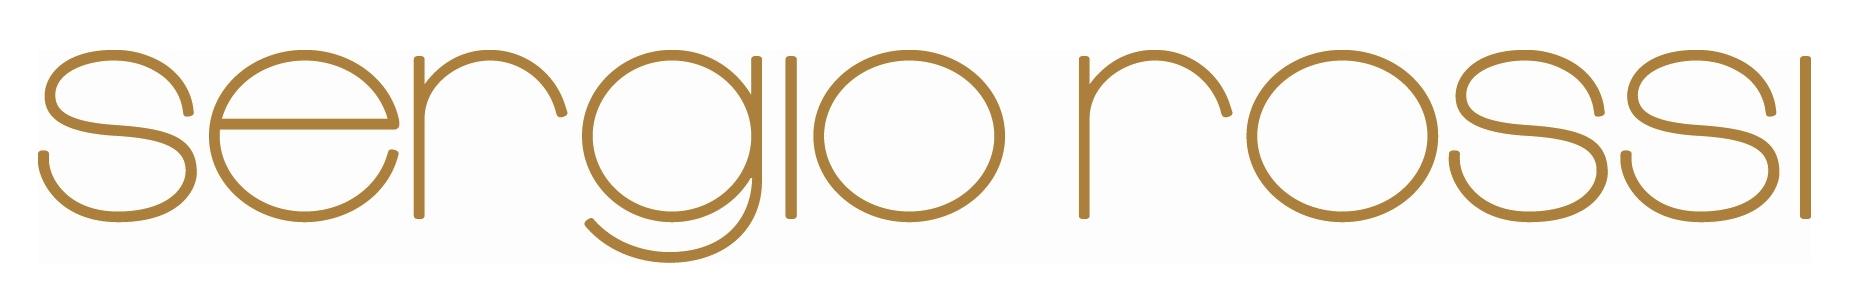 Sergio Rossi logo, logotype, wordmark